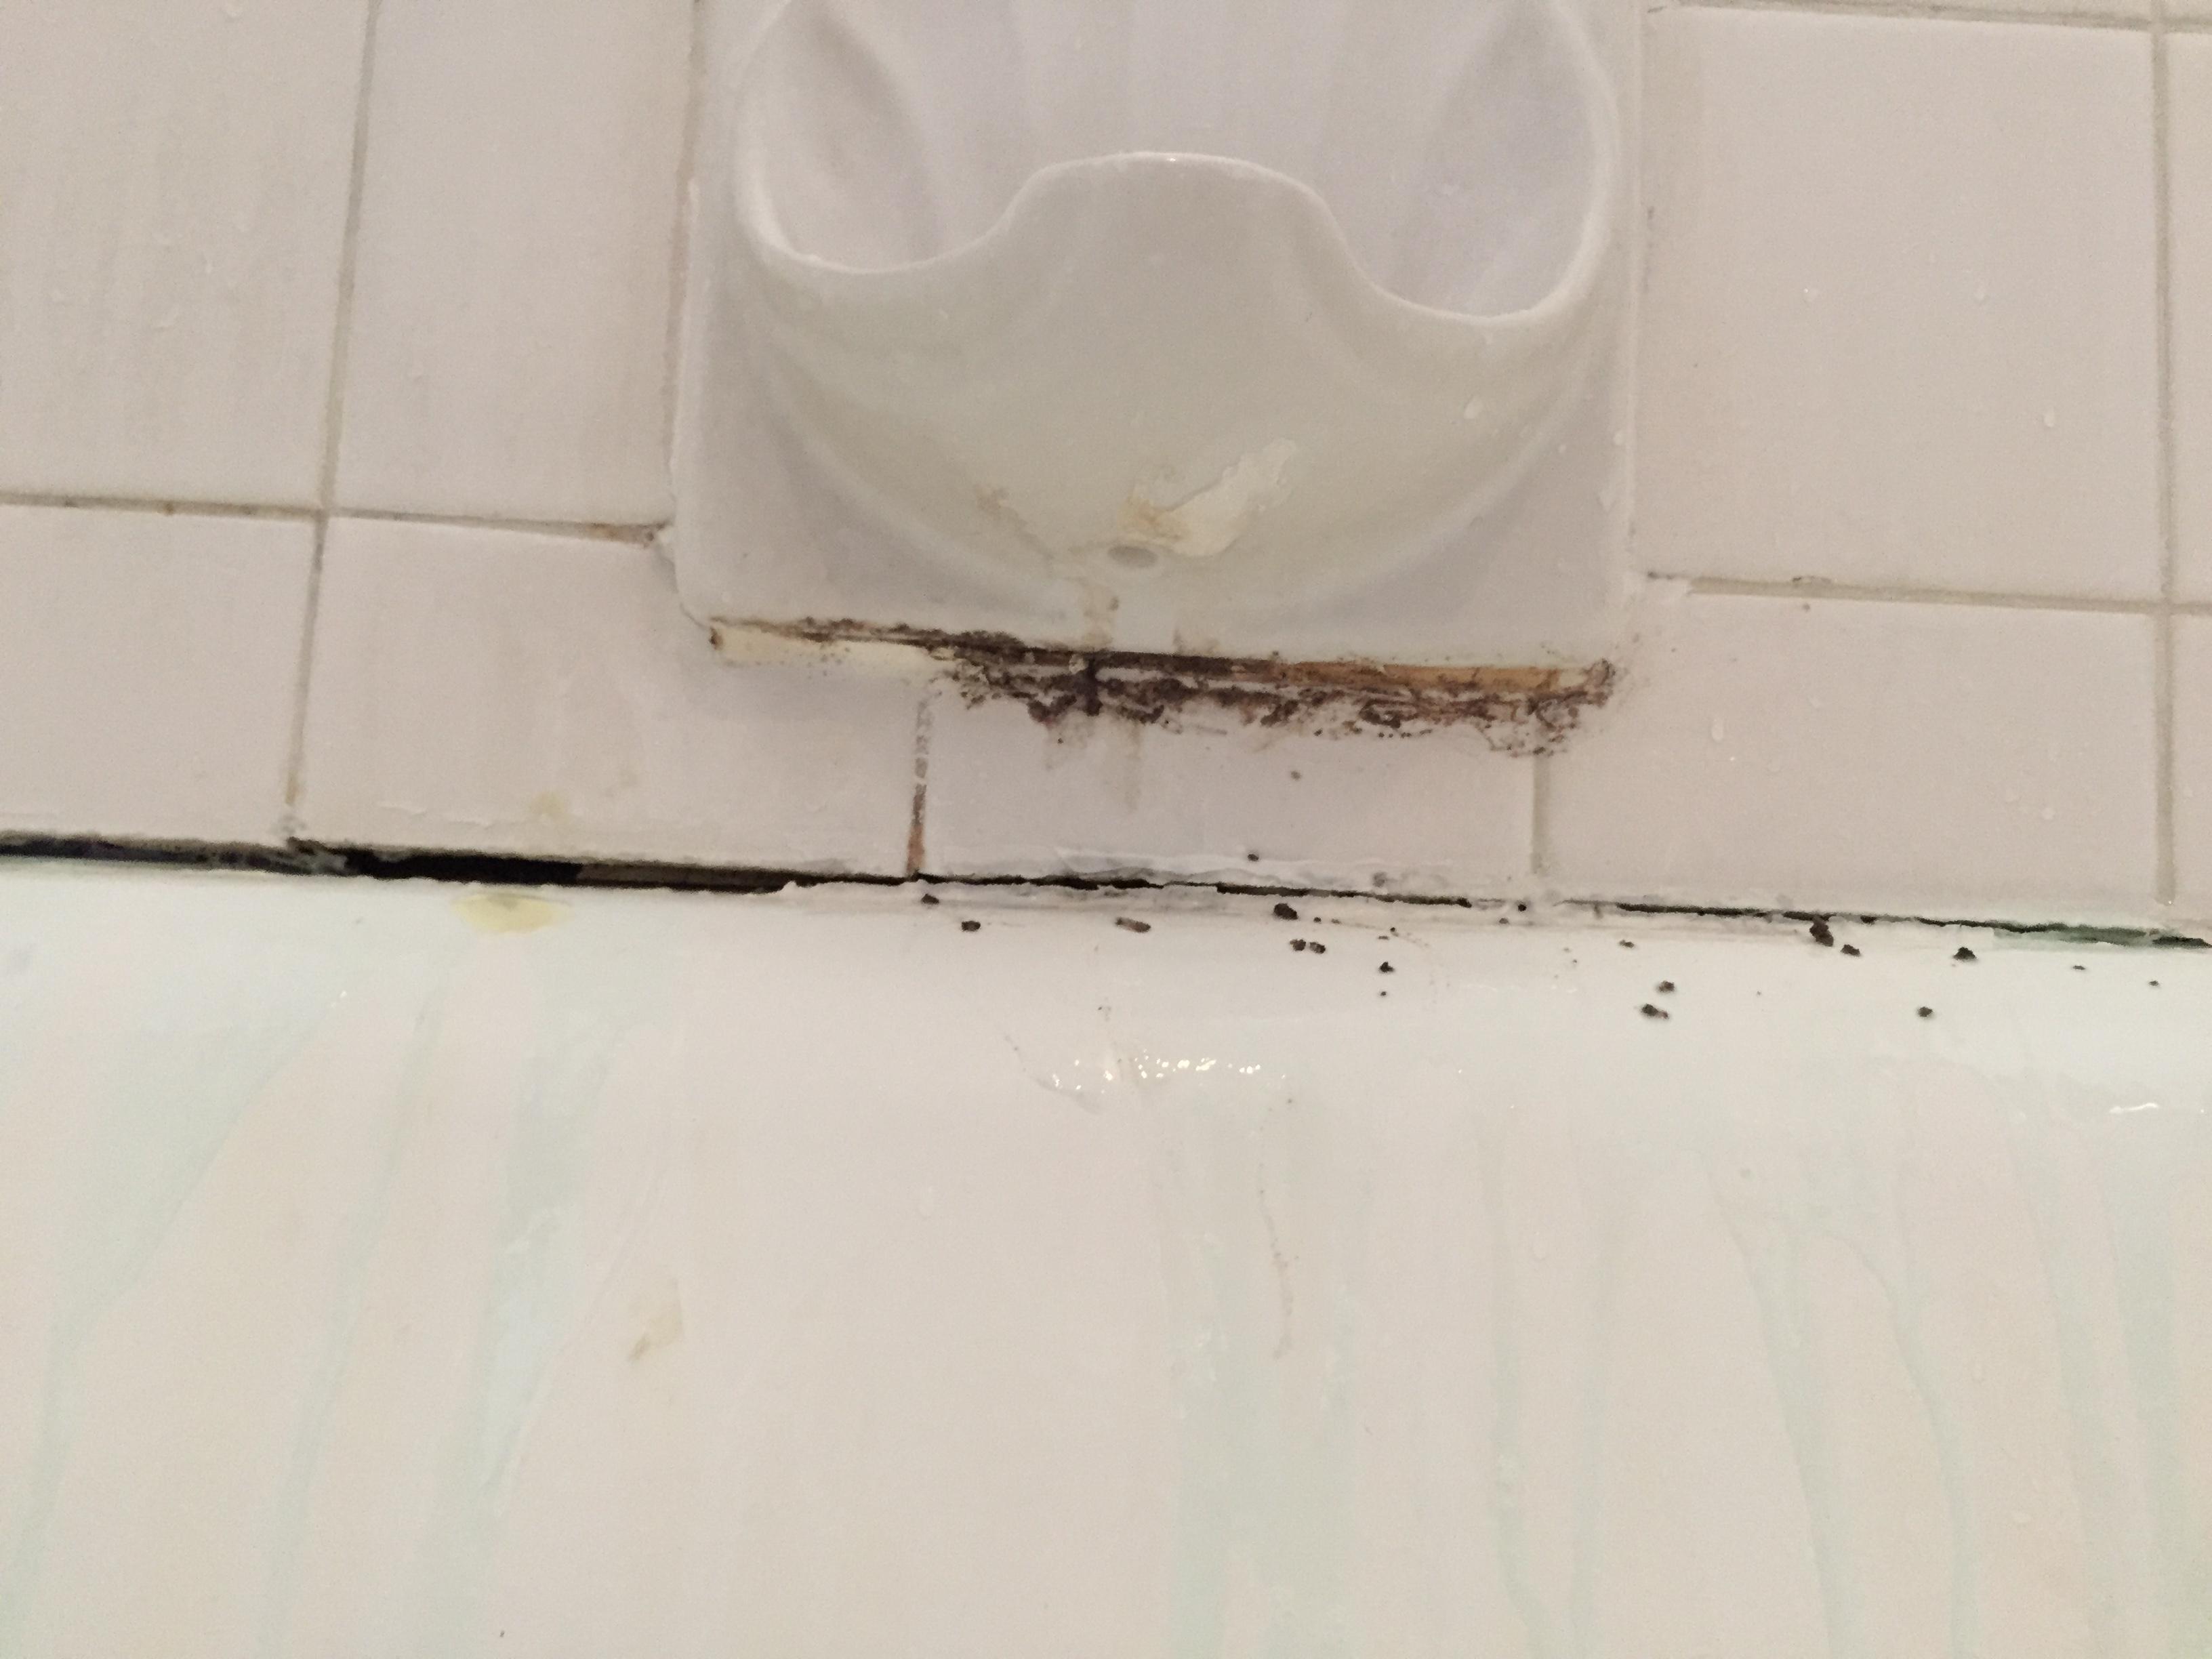 wave bathroom refinishing bathliner nickel w white tile img bp listello river walls hr trim window brushed tub kit rock liners